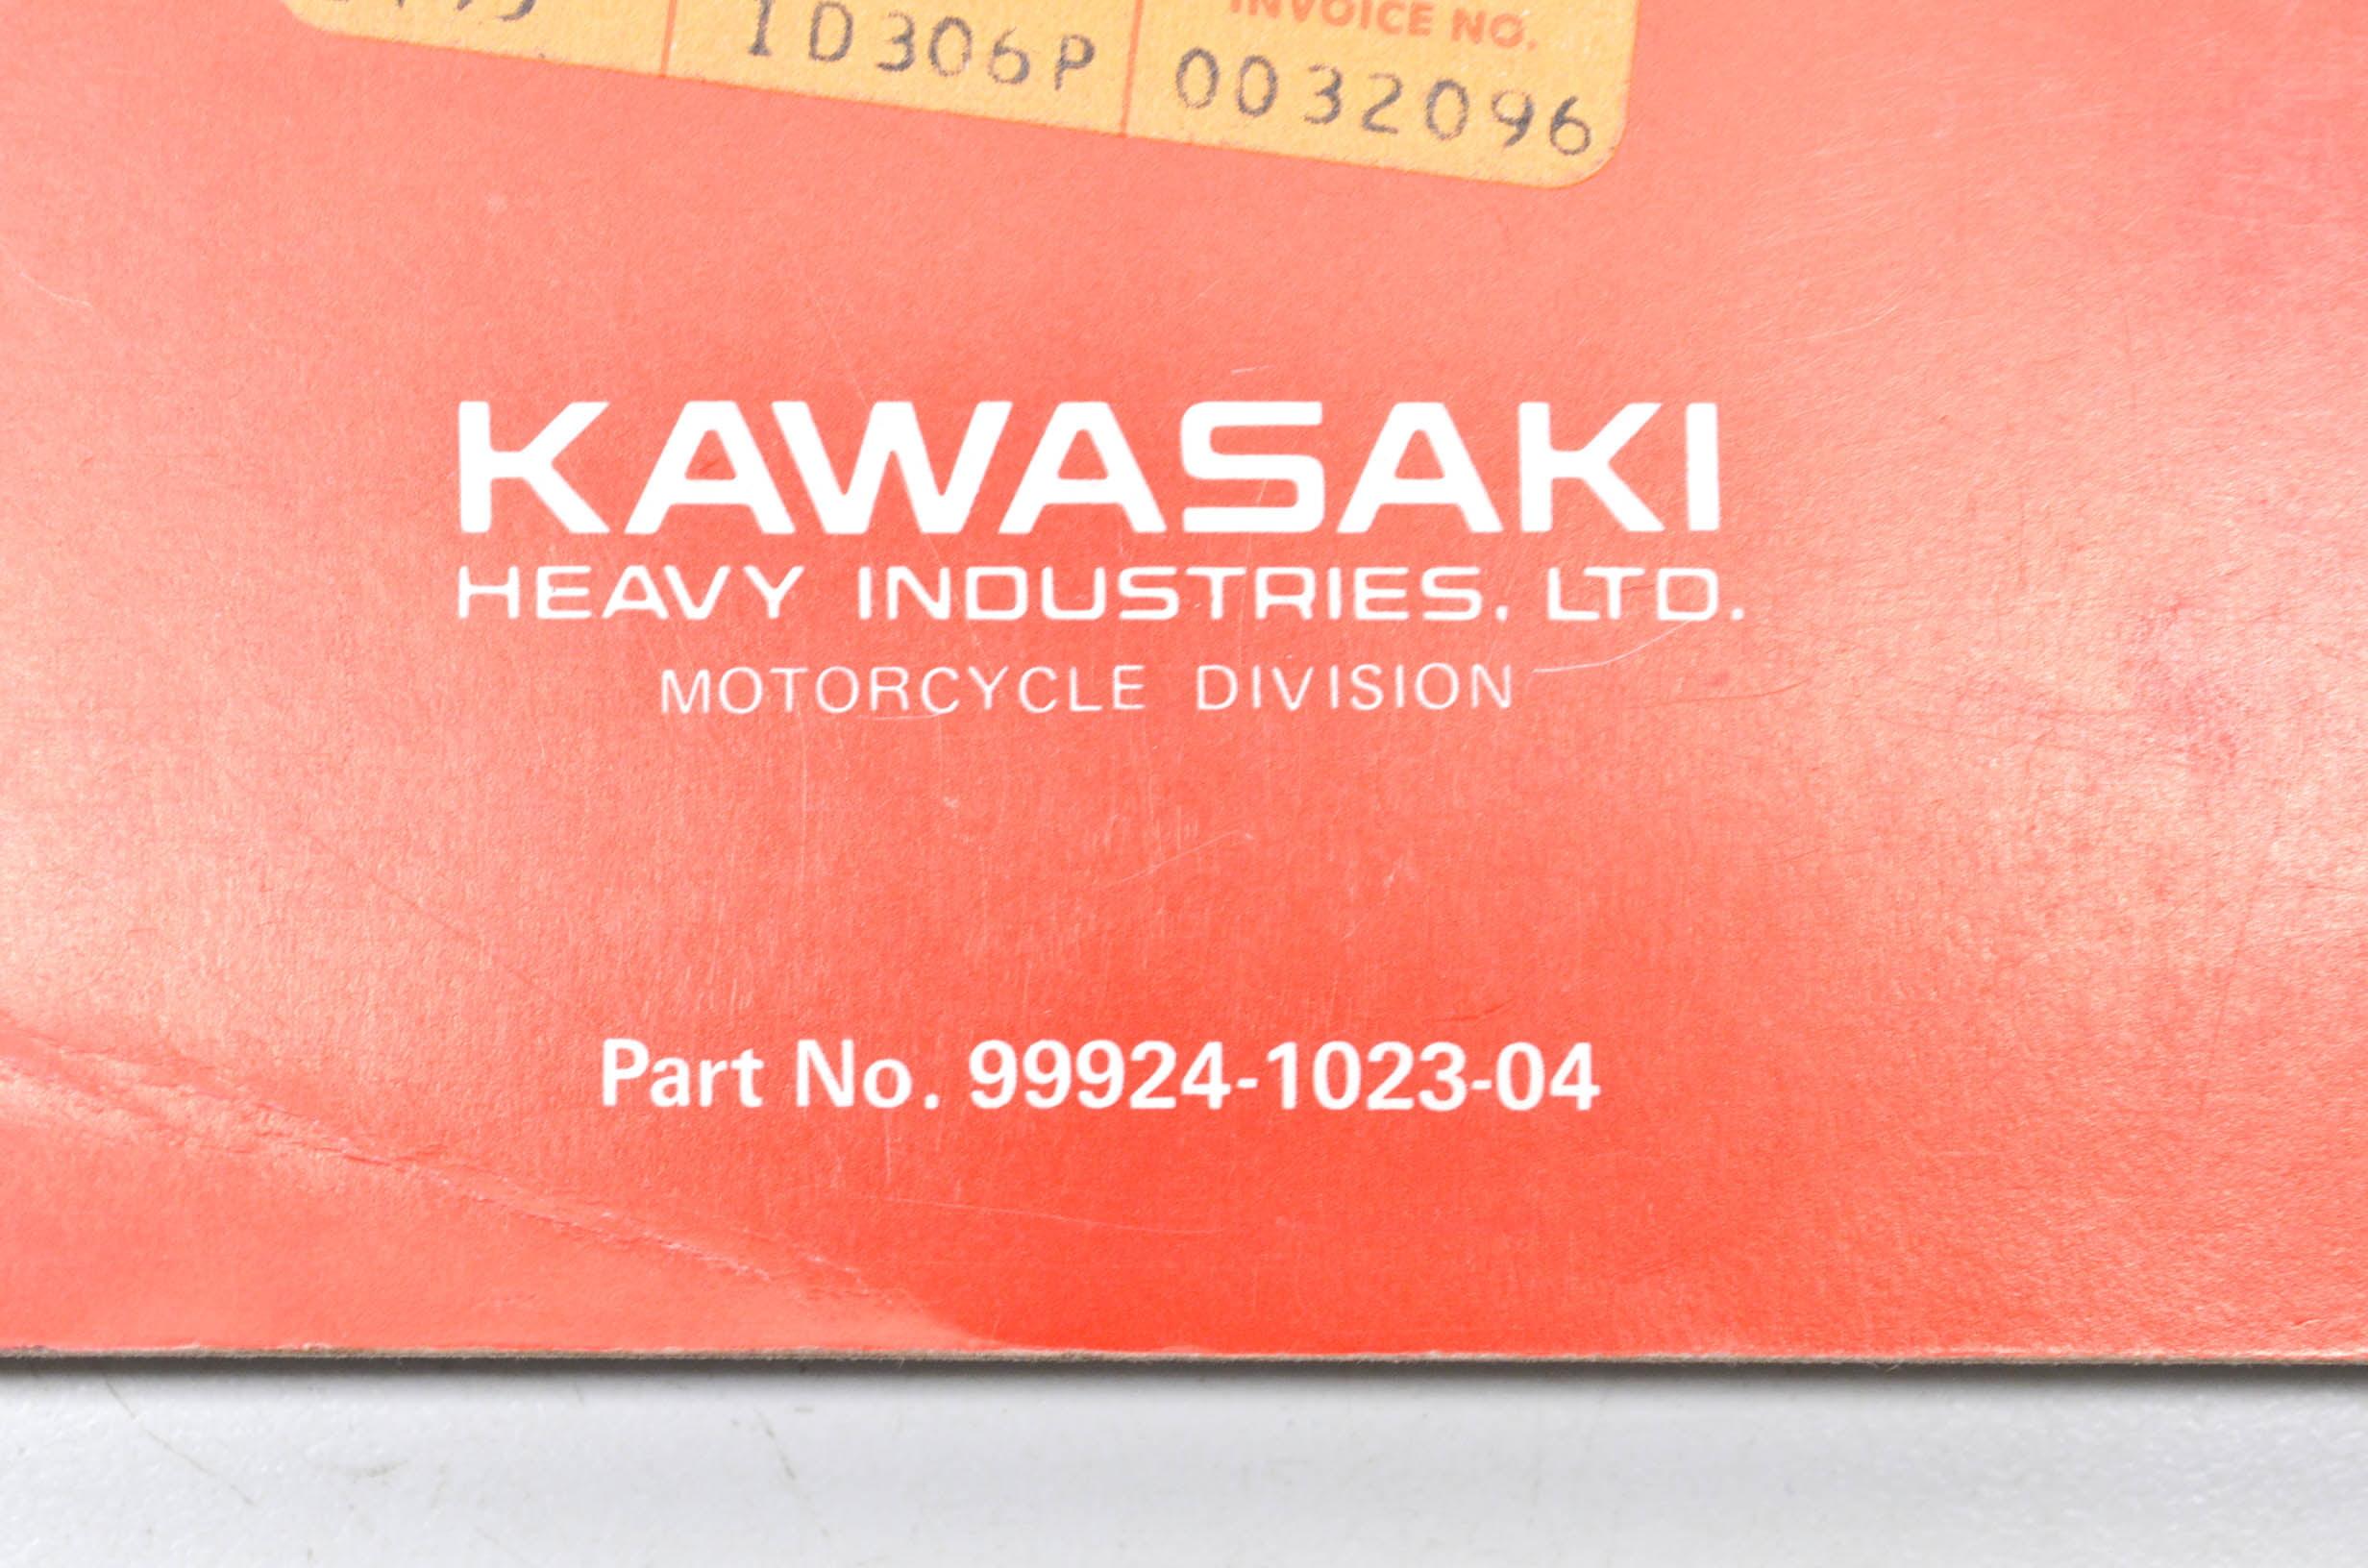 Kz250 Manual Hopkins Towing Solutions 4wire Flat Extension 18quot Walmartcom Kawasaki Service Korjaamokirja Array 99924 1023 04 1980 1983 Single Motorcycle Rh Walmart Com